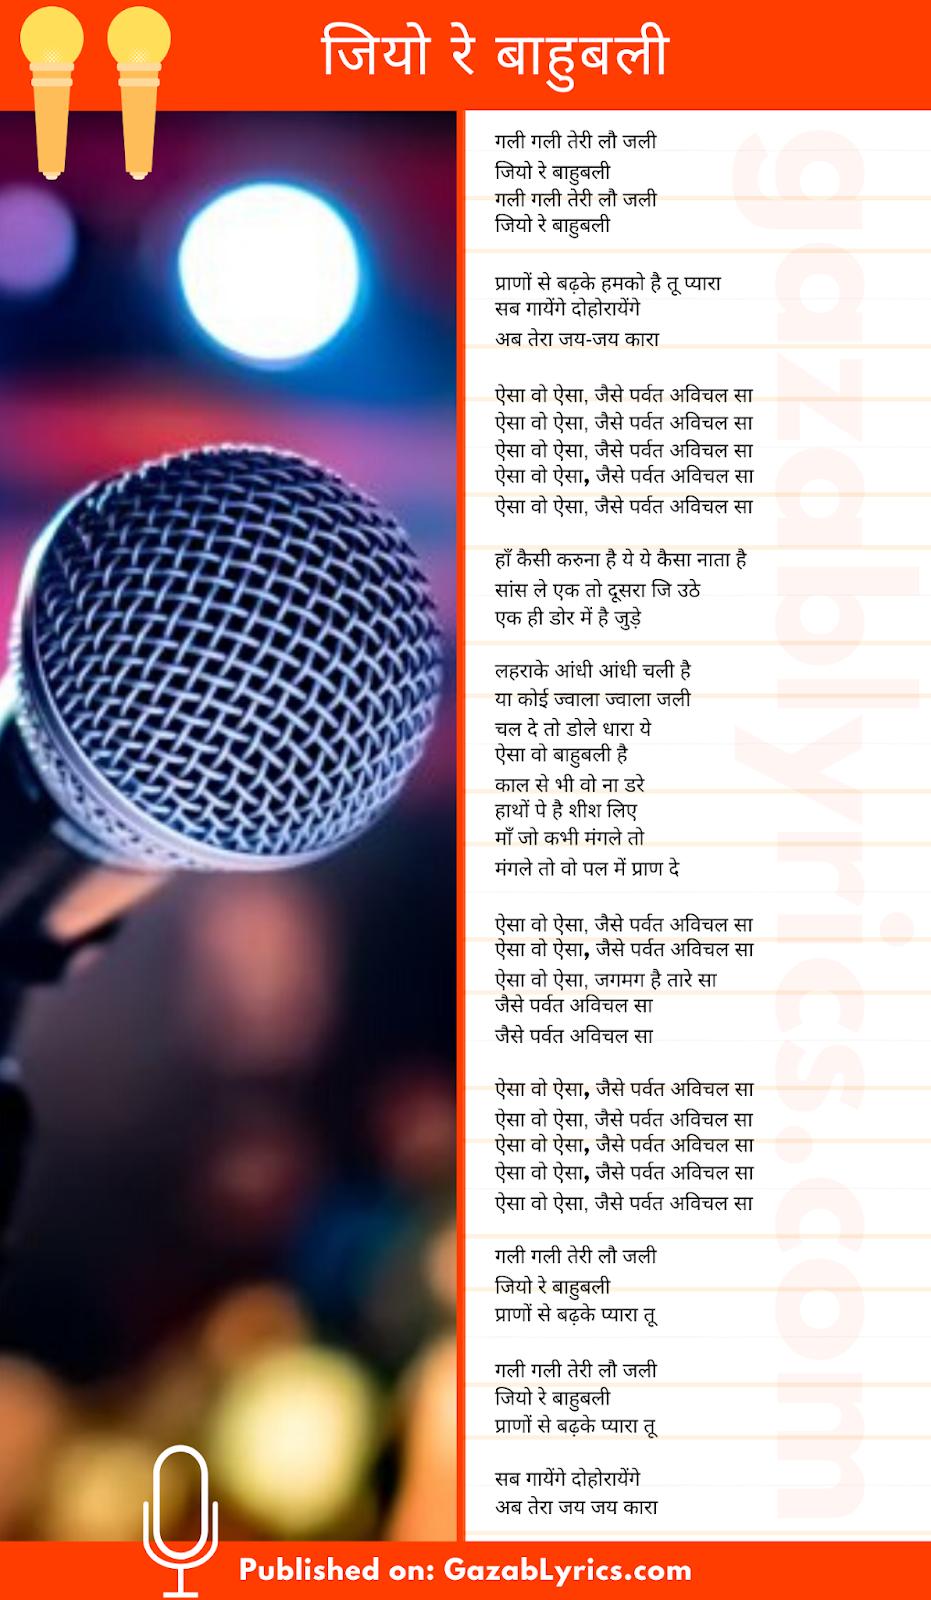 Jiyo Re Baahubali song lyrics image